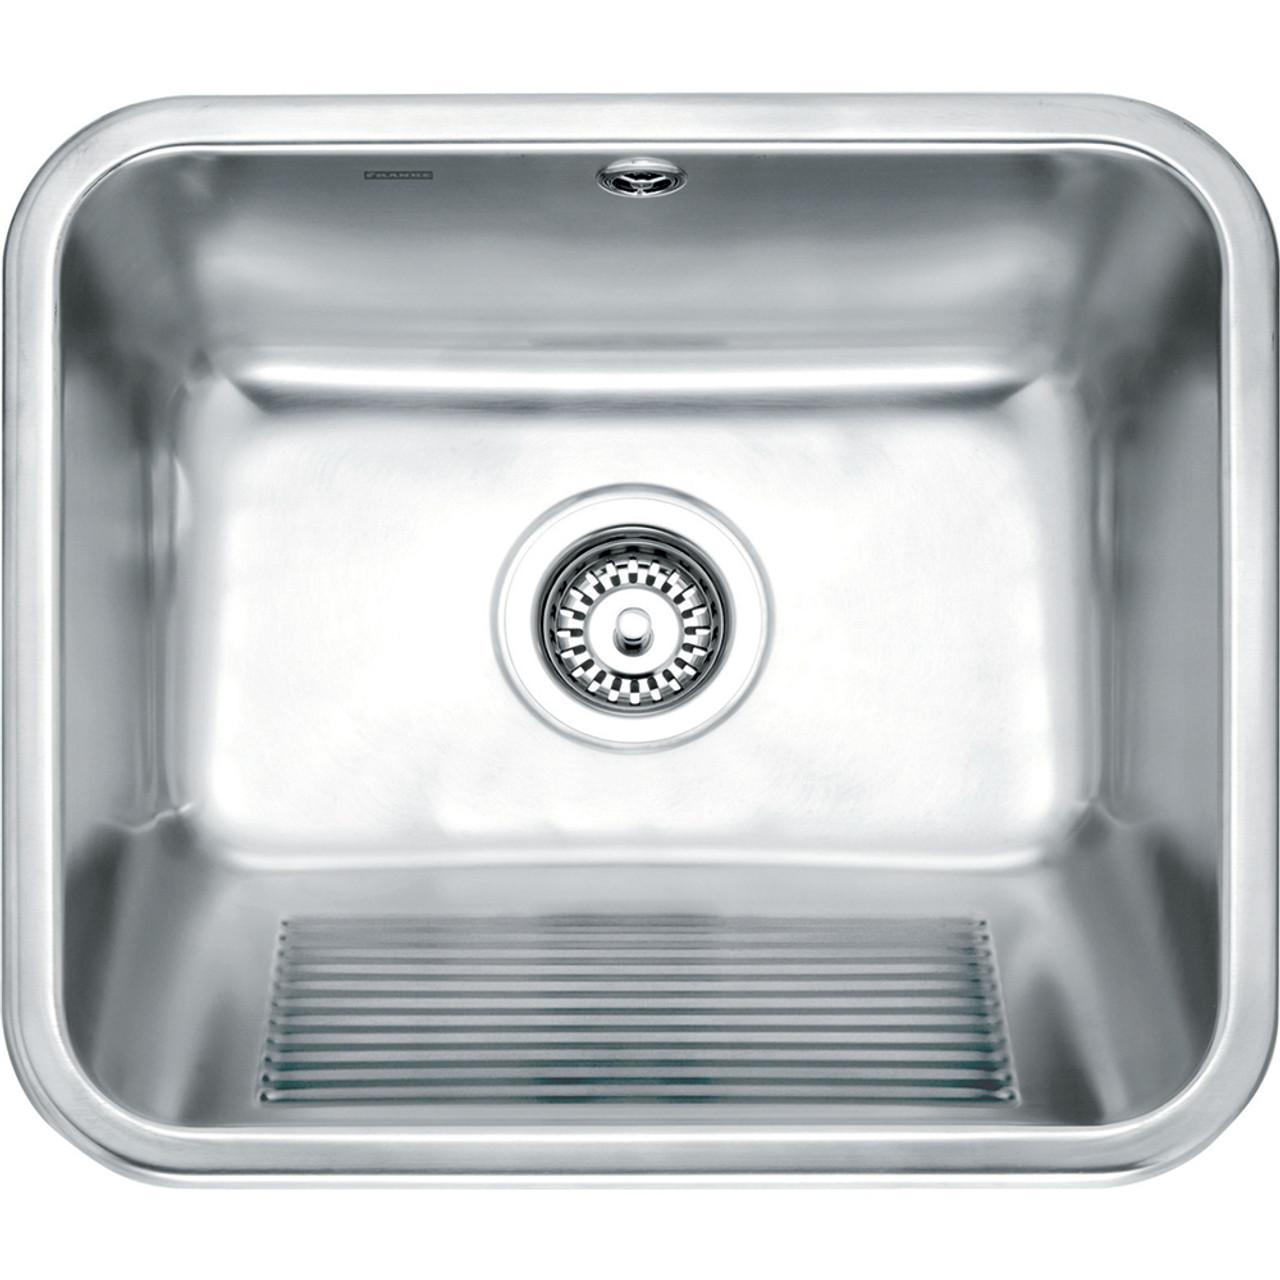 franke utility utx610 stainless steel kitchen sink - sinks